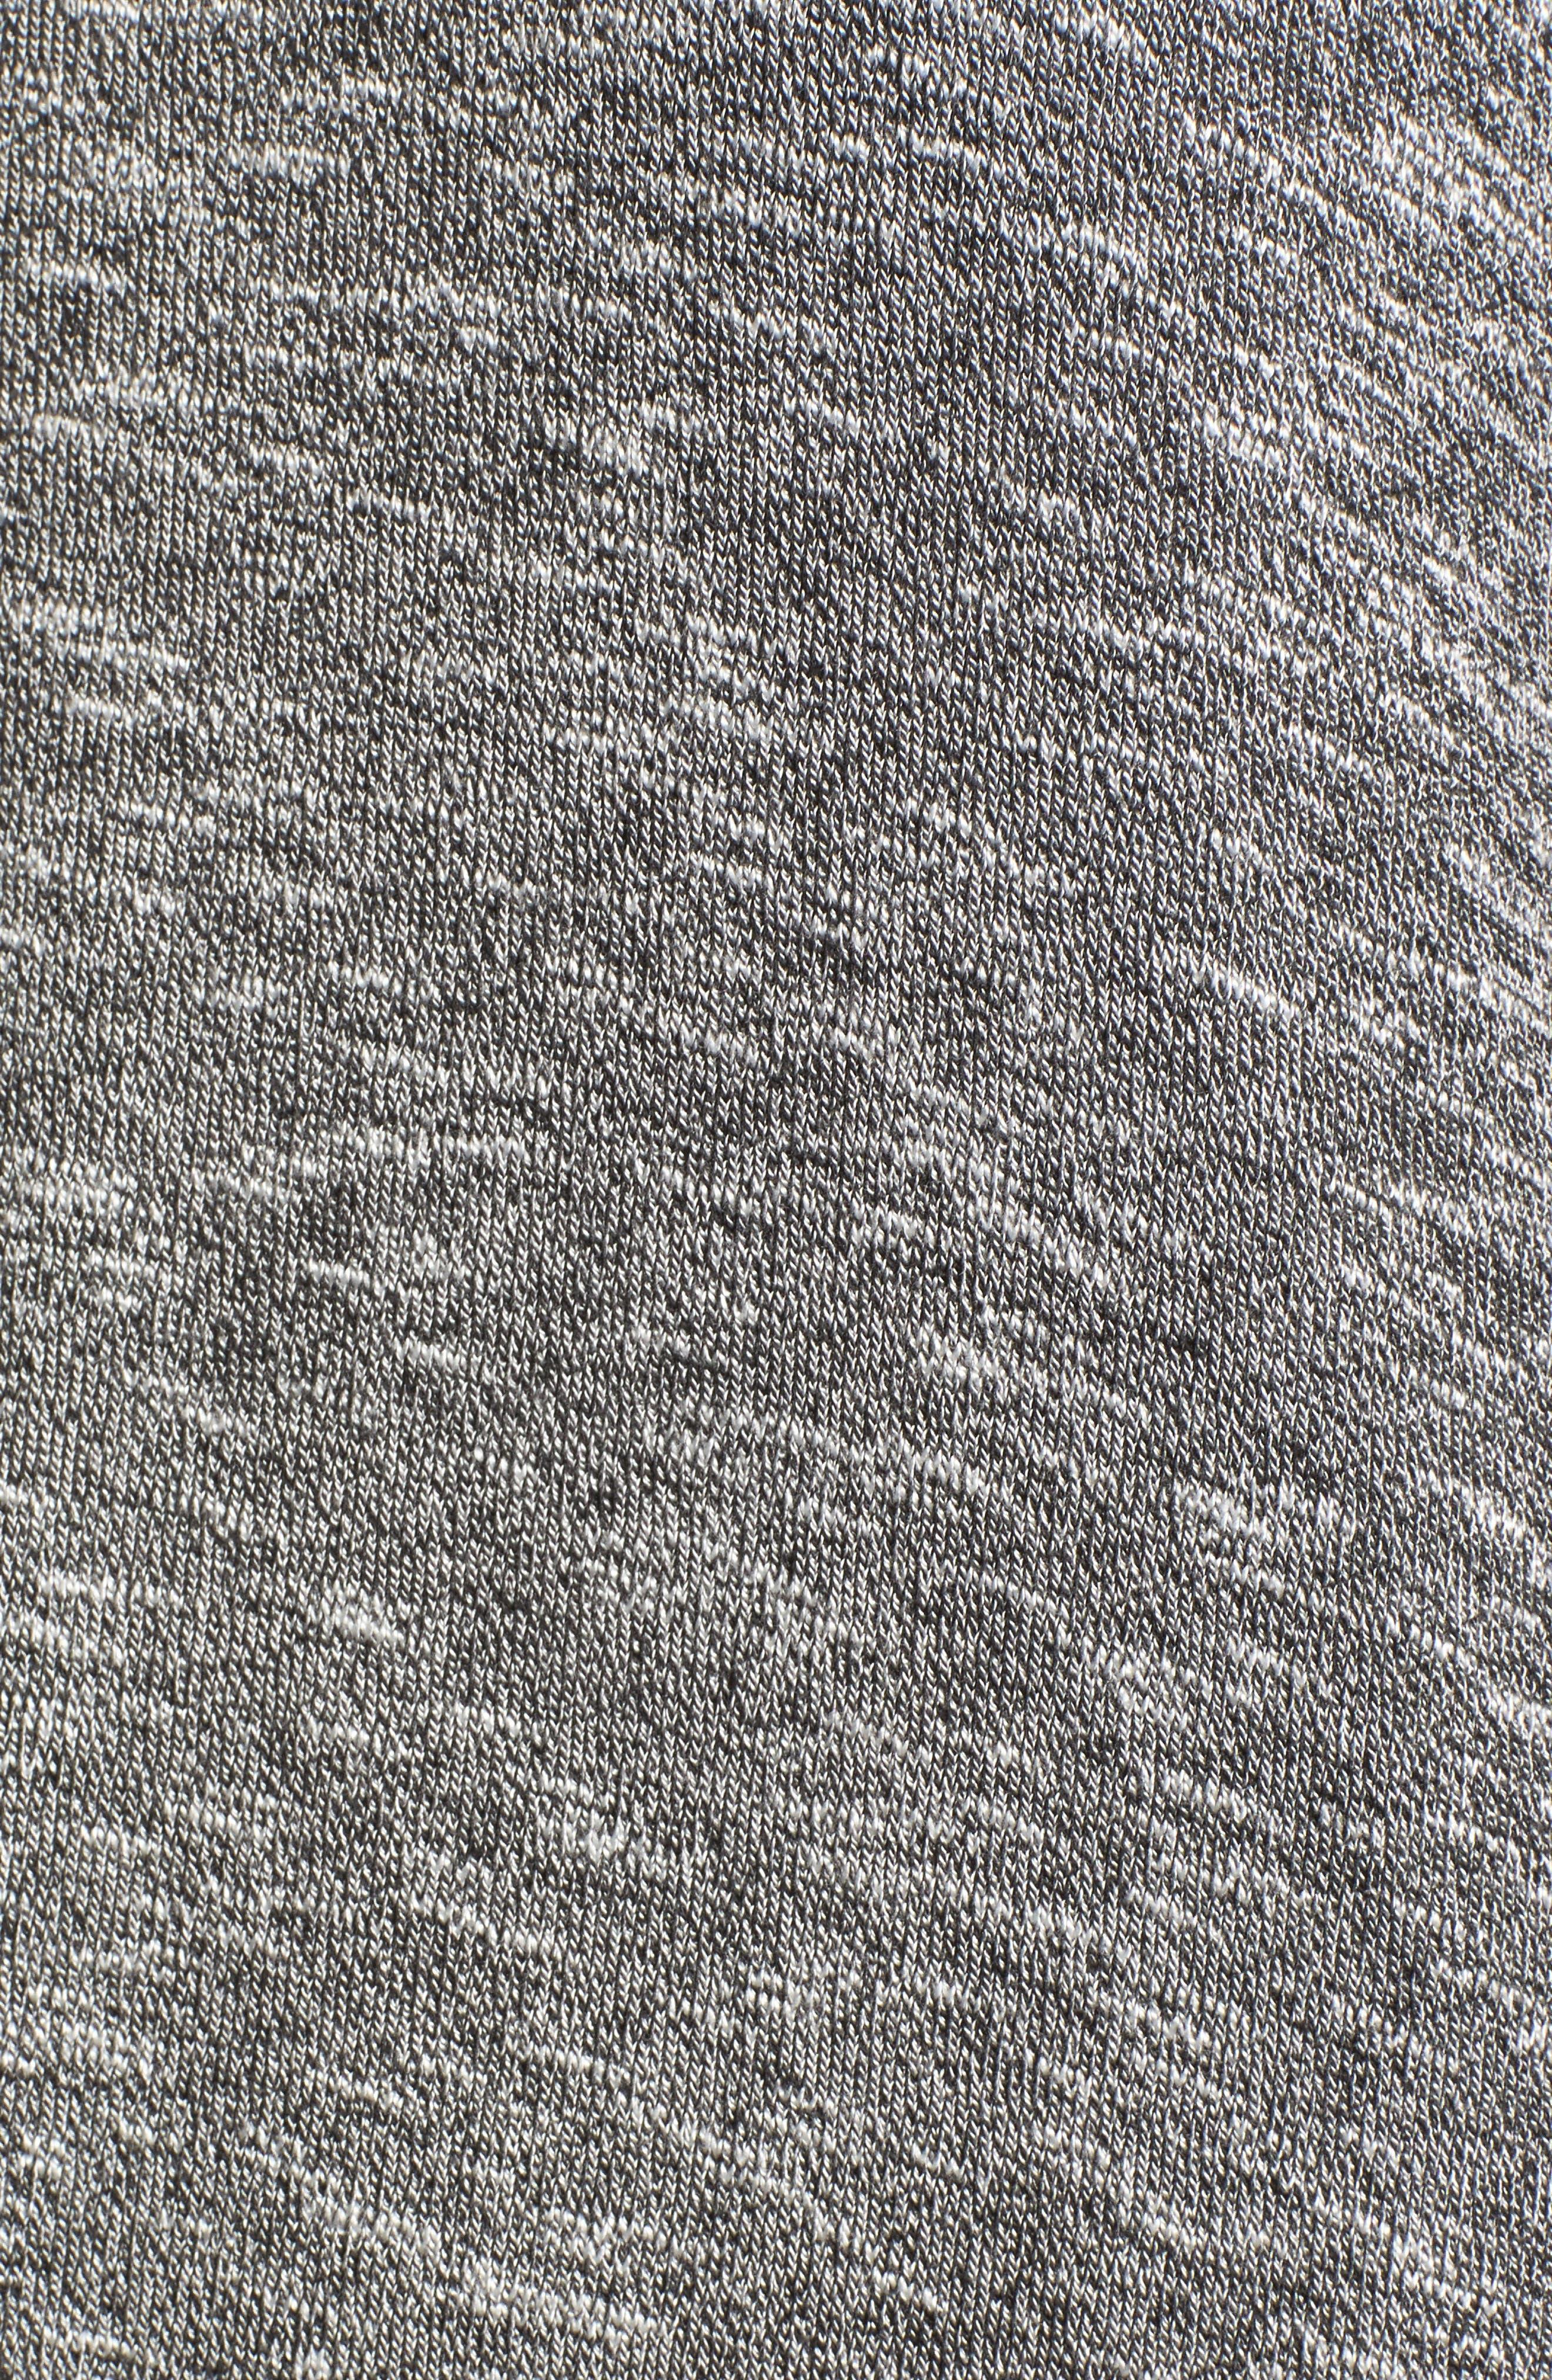 Alternate Image 5  - Love, Fire Knit Puff Shoulder Dress